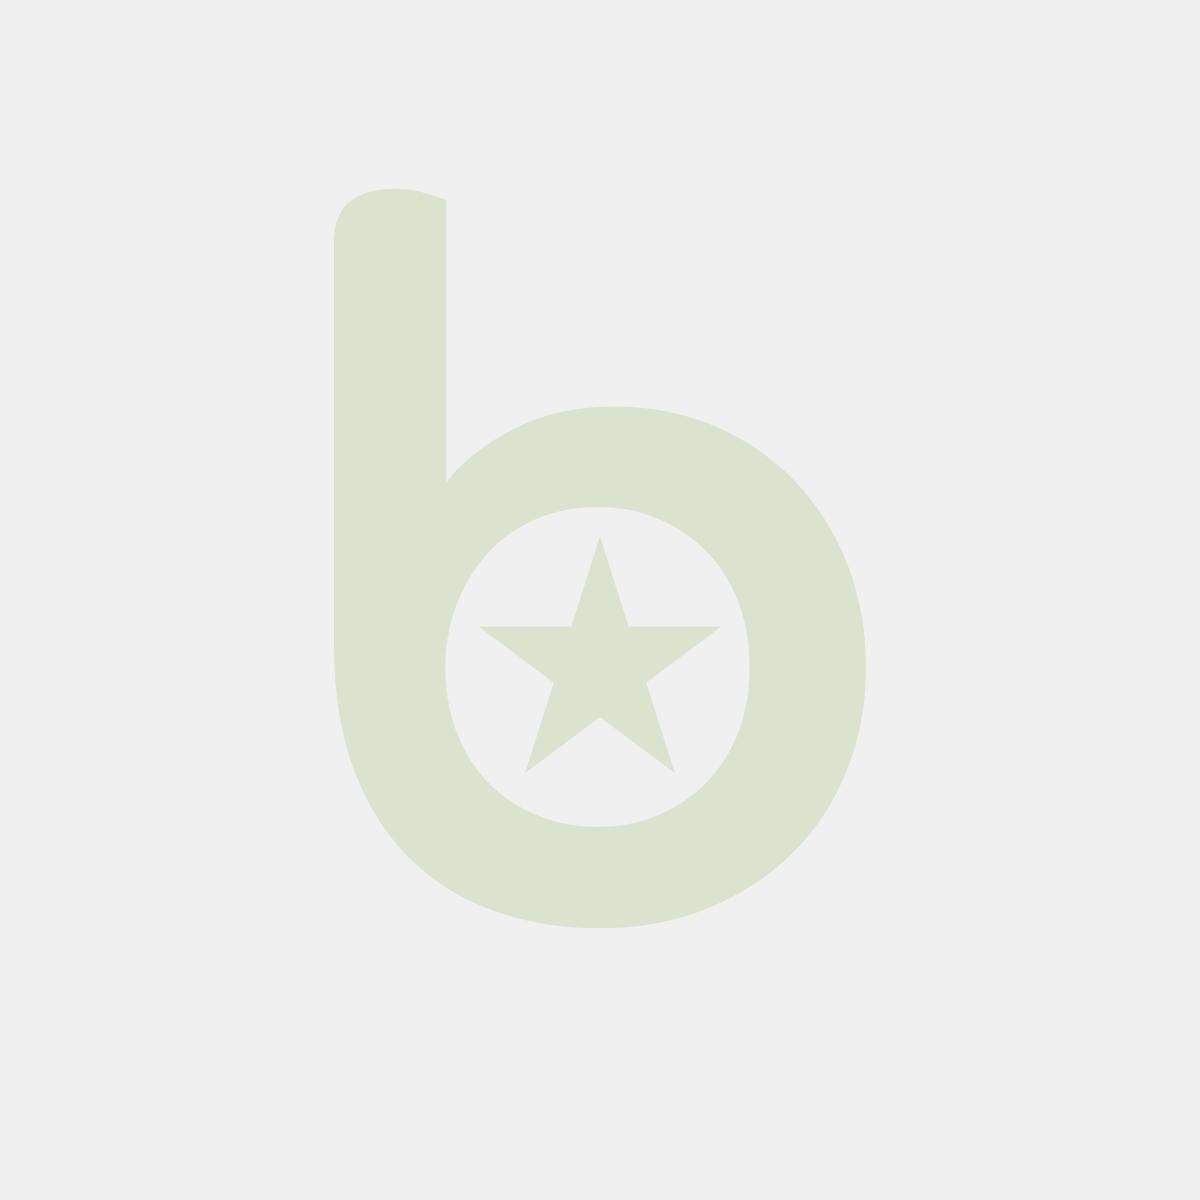 Gałkownica Stöckel - Owalna 1/20